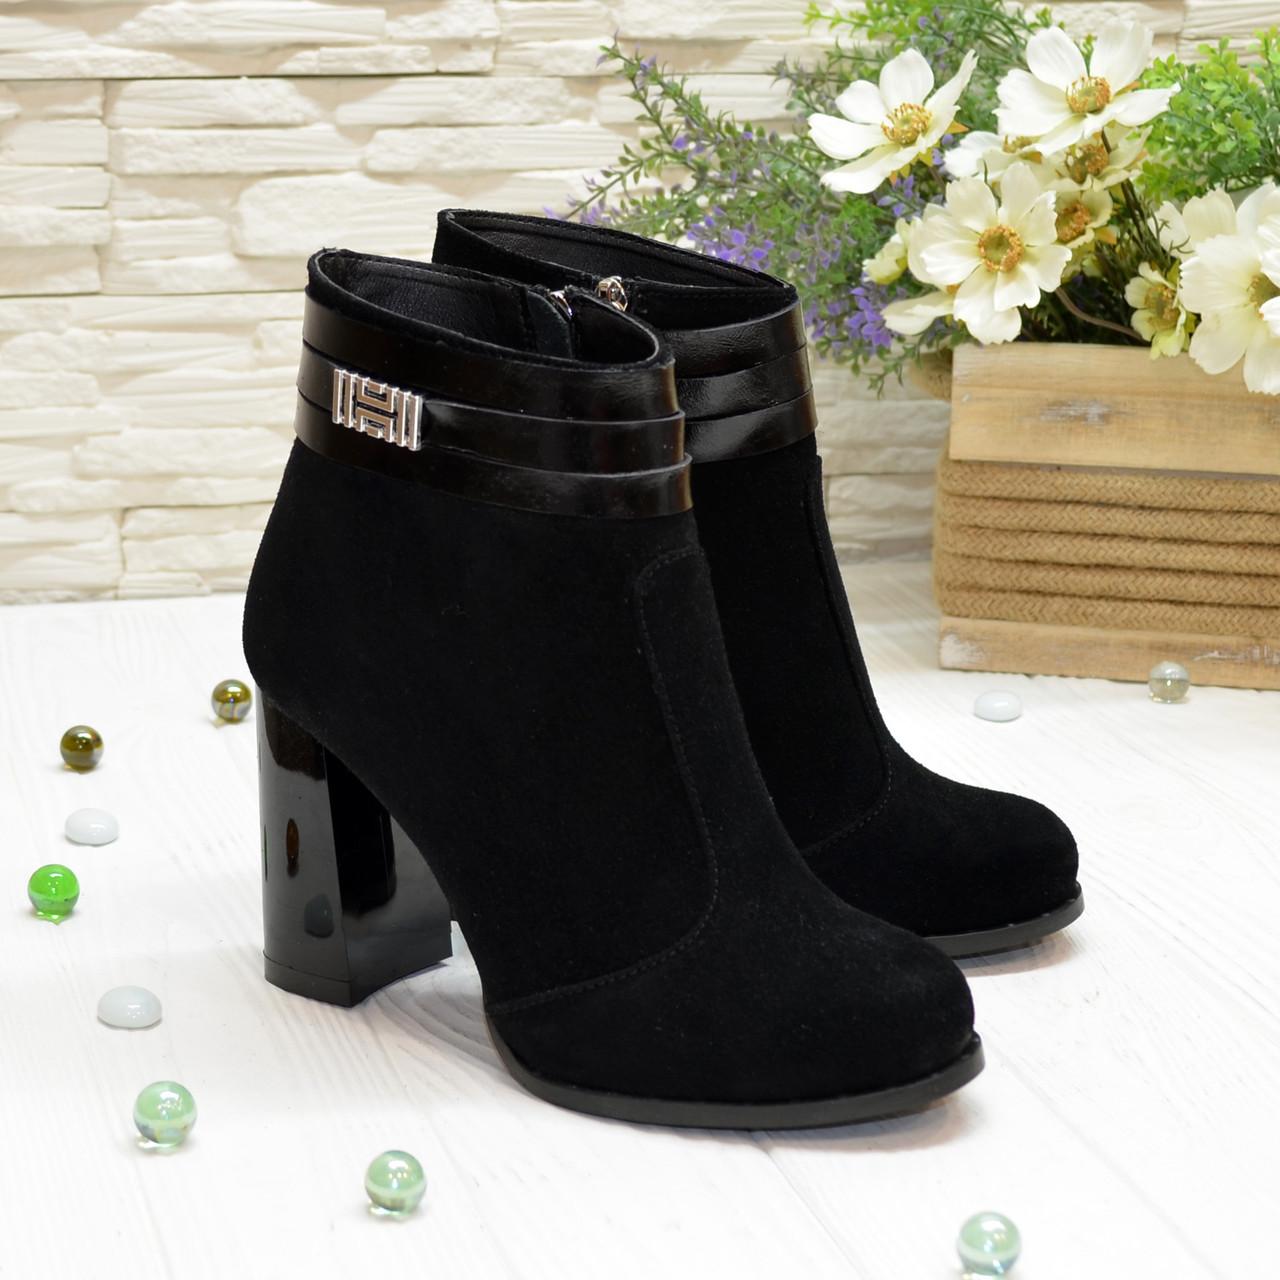 Ботинки женские замшевые на устойчивом каблуке